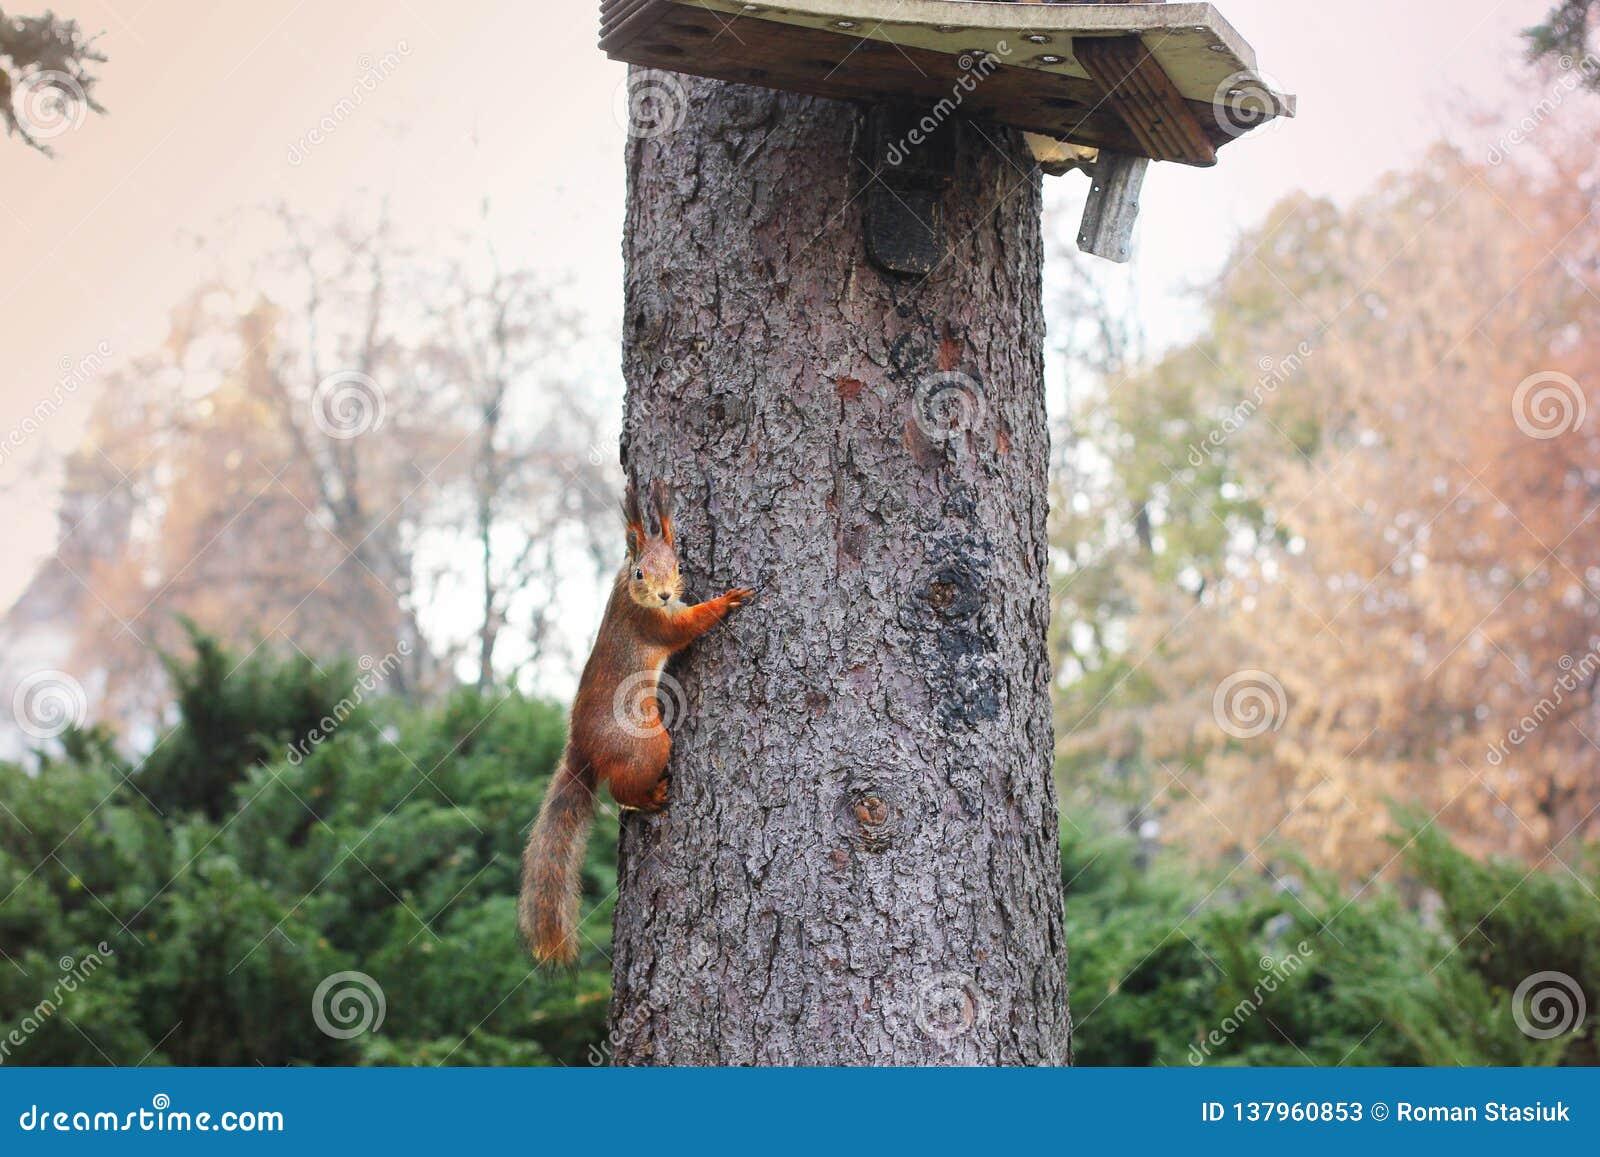 Nyfiken ekorre röd ekorre ekorre Höst Vinter Forest Beautiful ekorre